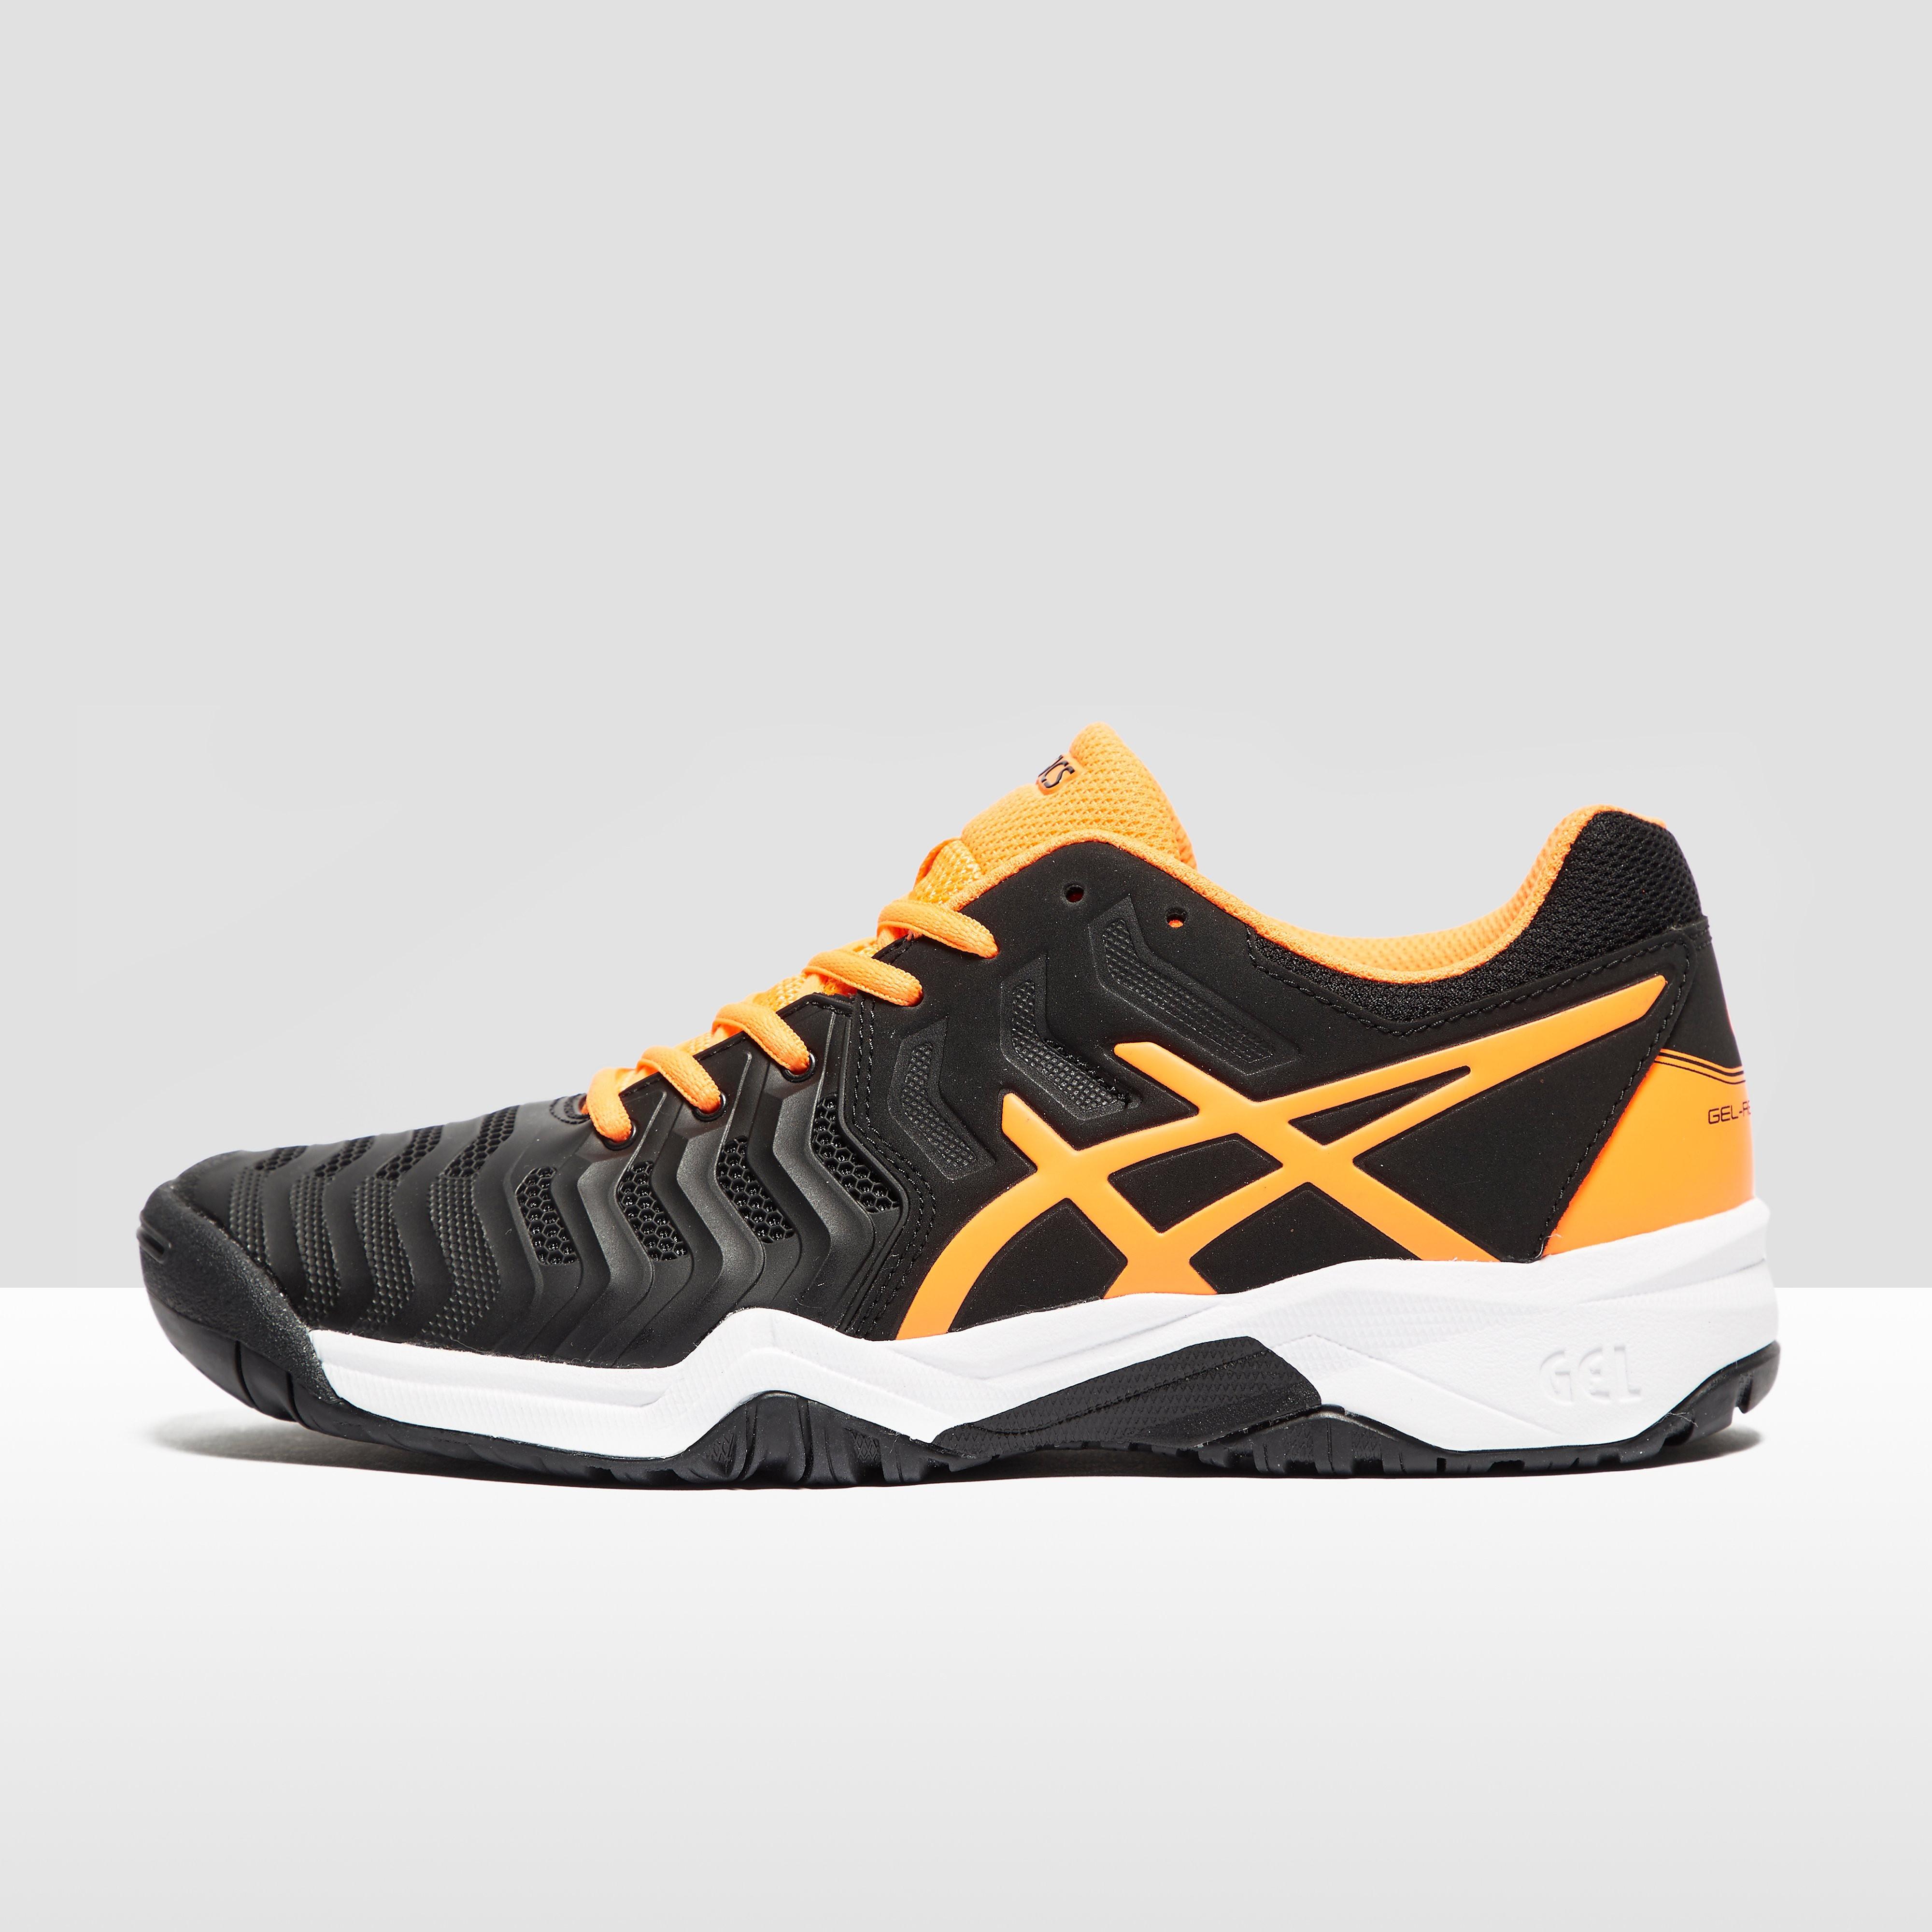 ASICS GEL-RESOLUTION 7 Junior Tennis Shoes